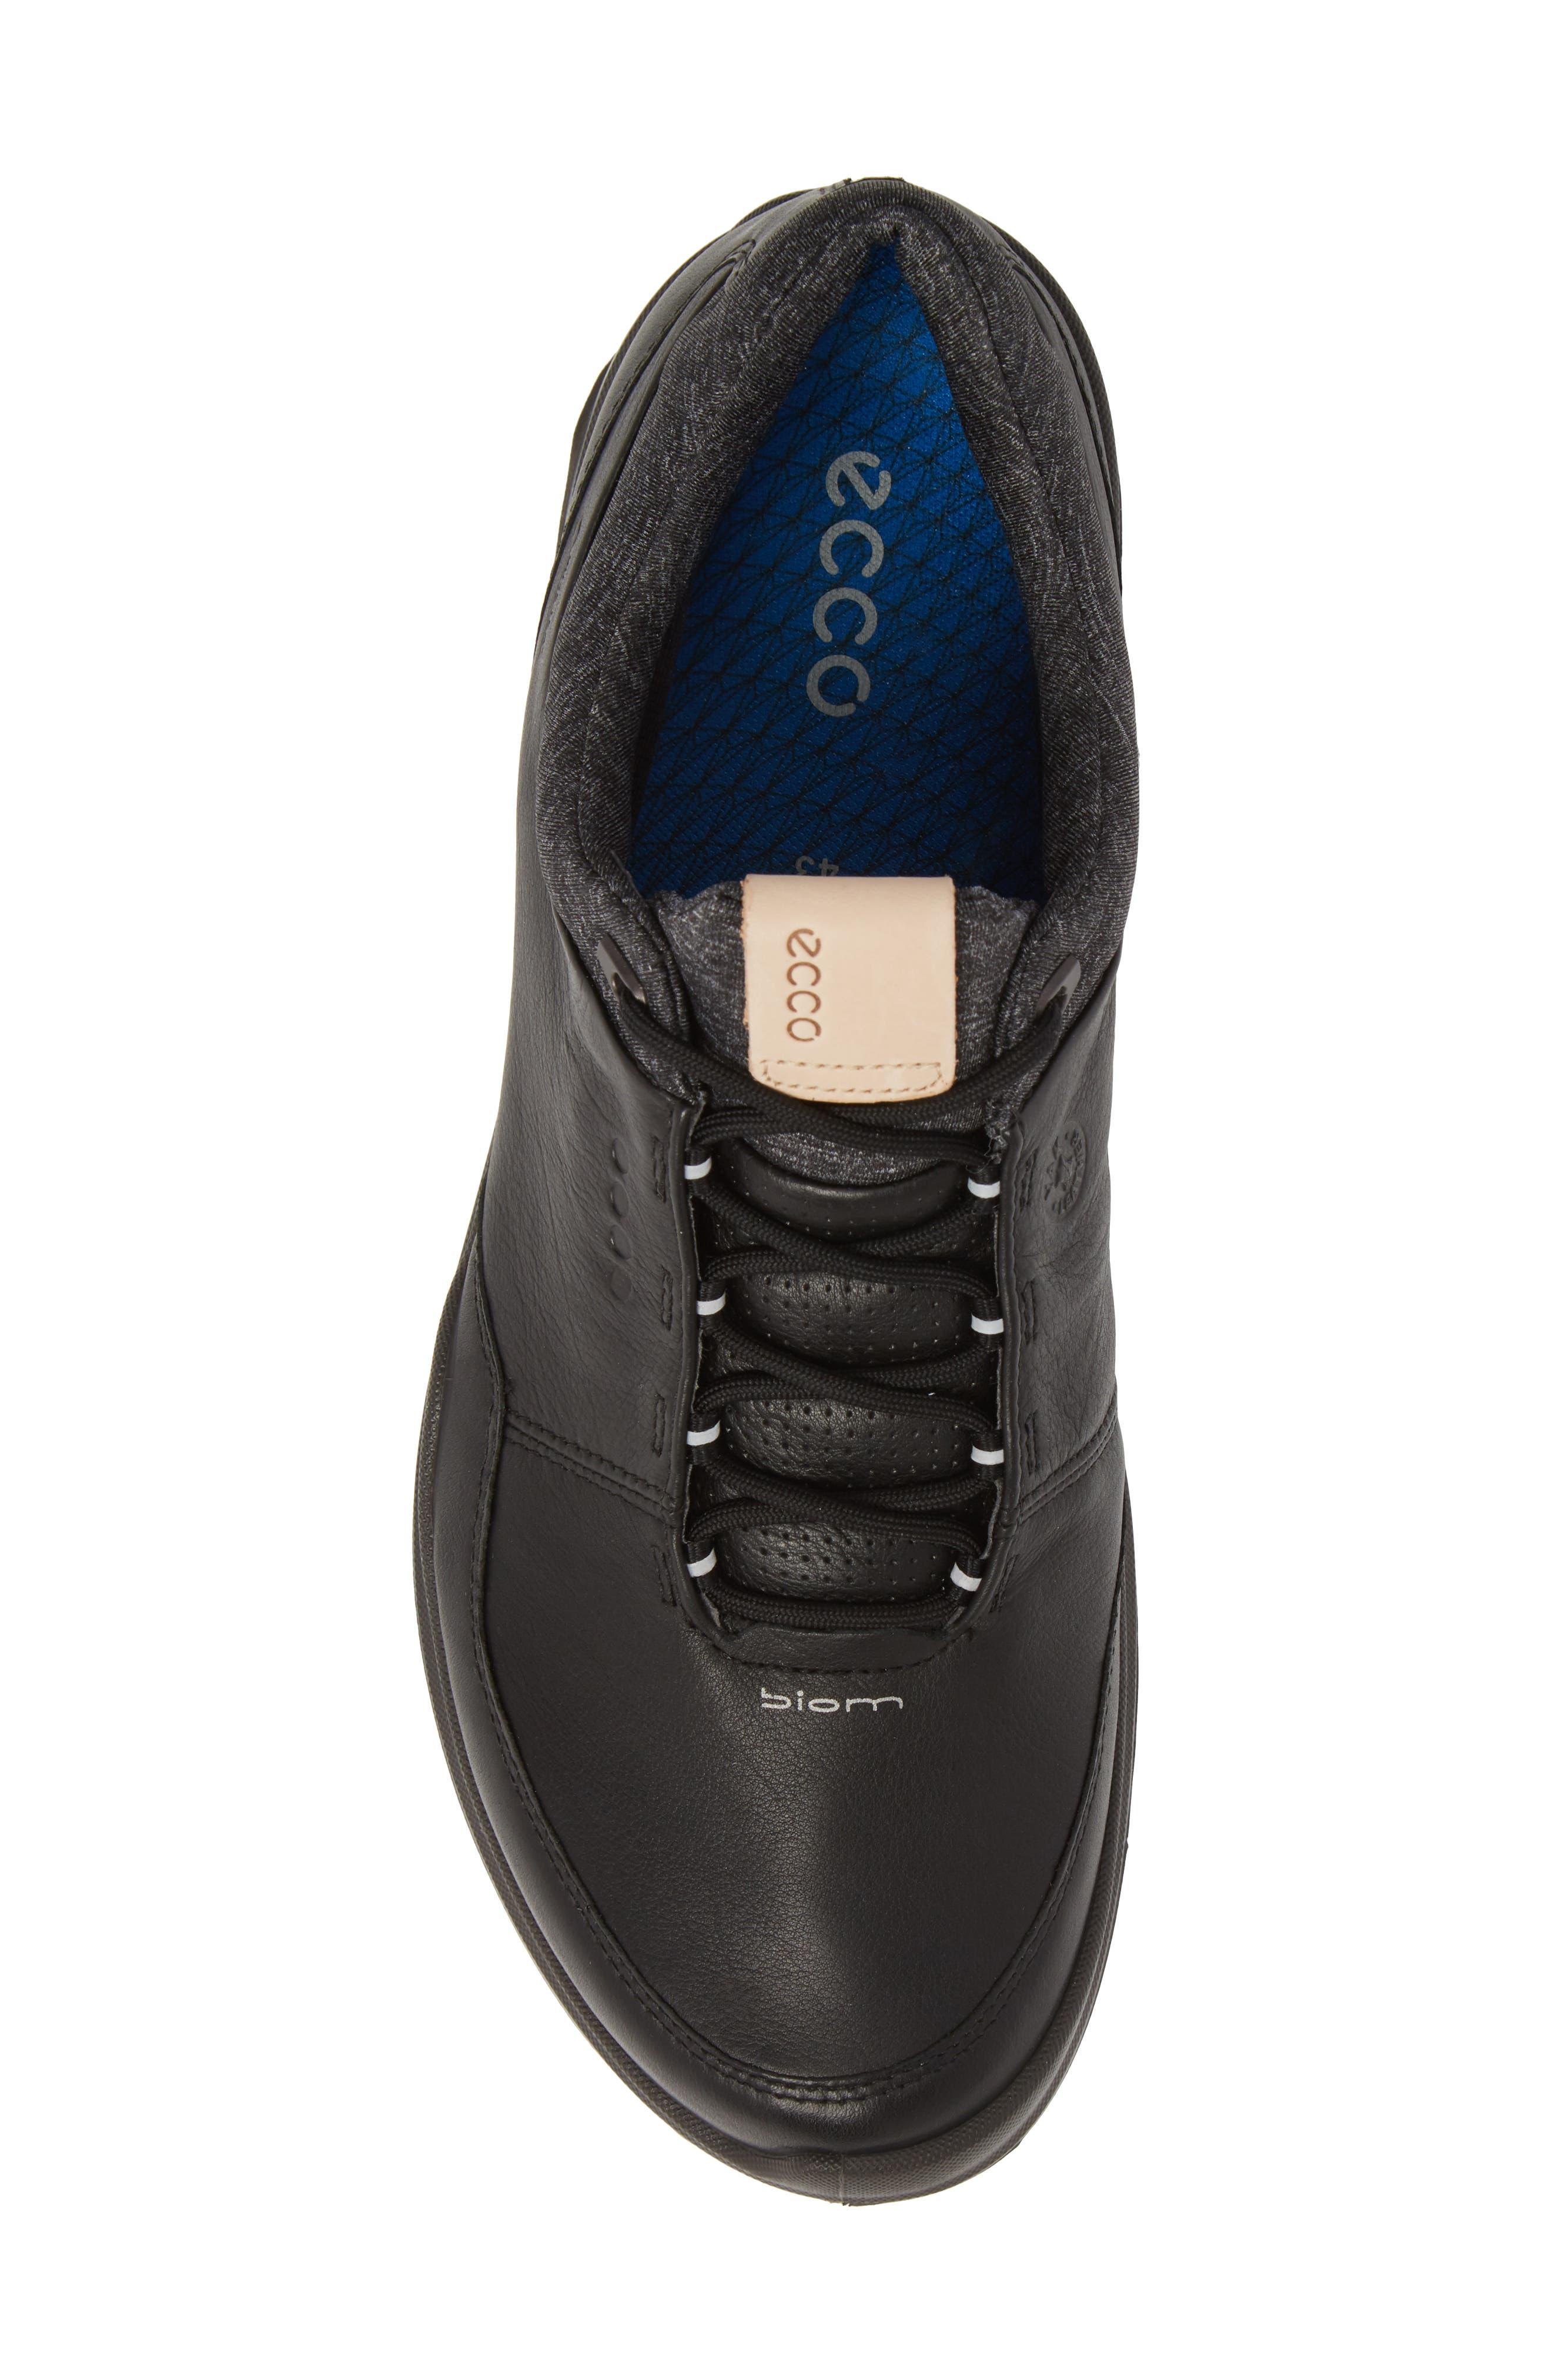 ECCO, BIOM Hybrid 3 Gore-Tex<sup>®</sup> Golf Shoe, Alternate thumbnail 5, color, BLACK/ BERMUDA BLUE LEATHER